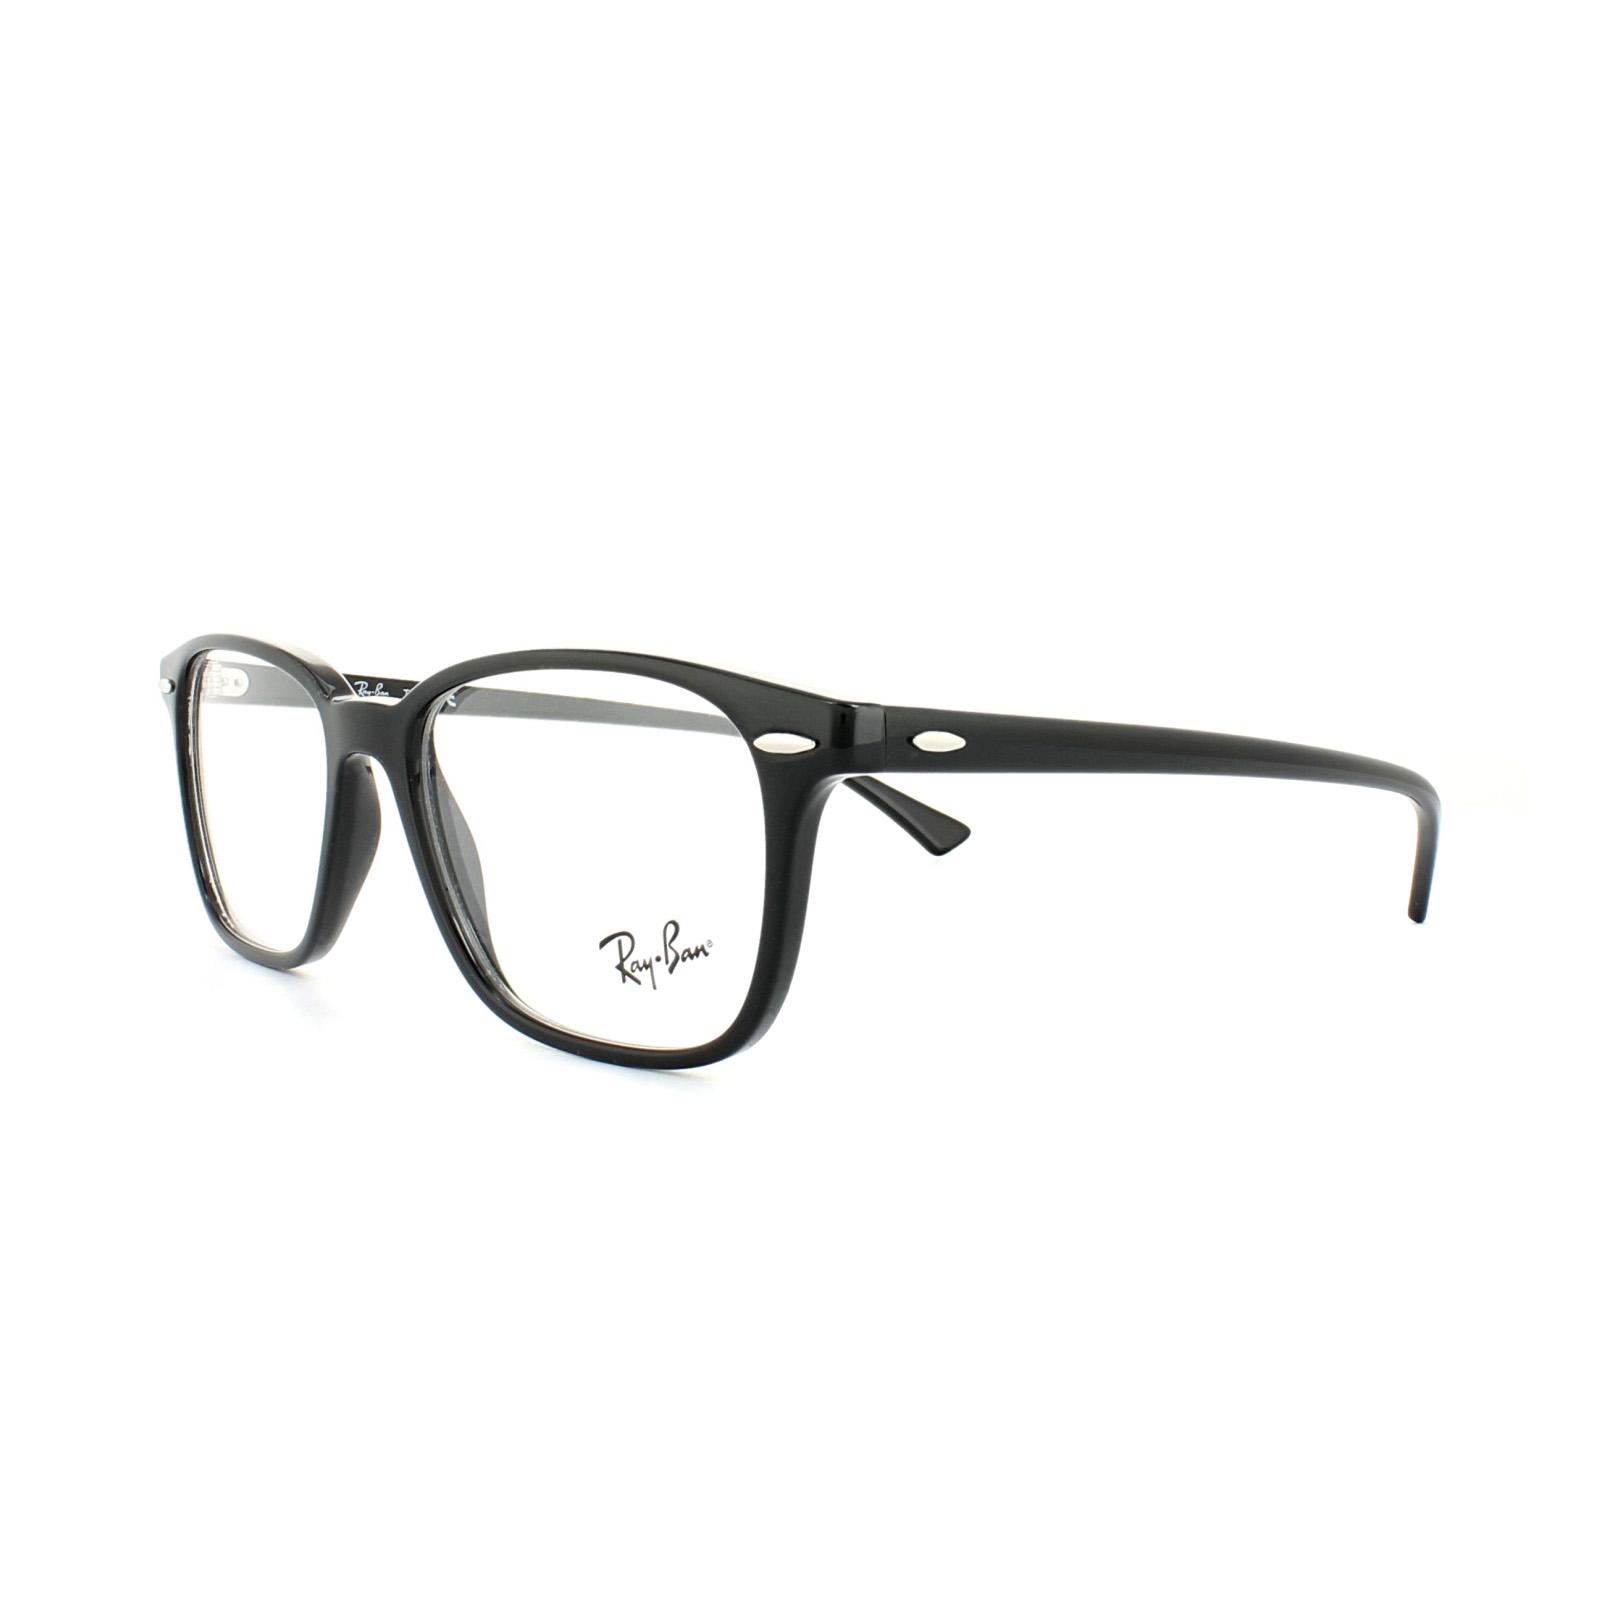 97b30cd451 Sentinel Ray-Ban Glasses Frames 7119 2000 Black Mens Womens 53mm